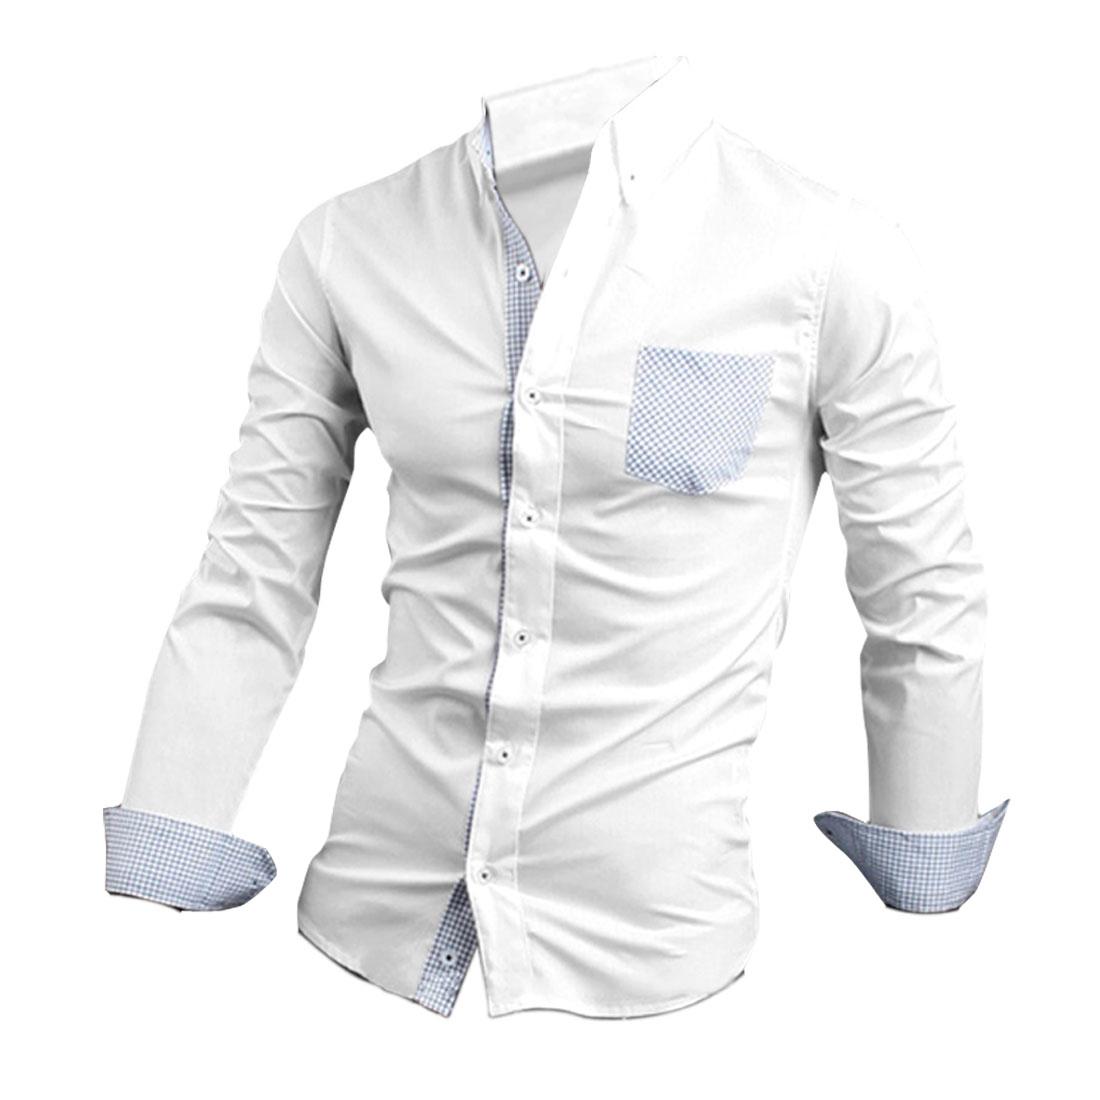 Men's Point Collar Single Breasted Panel Design White M Shirt